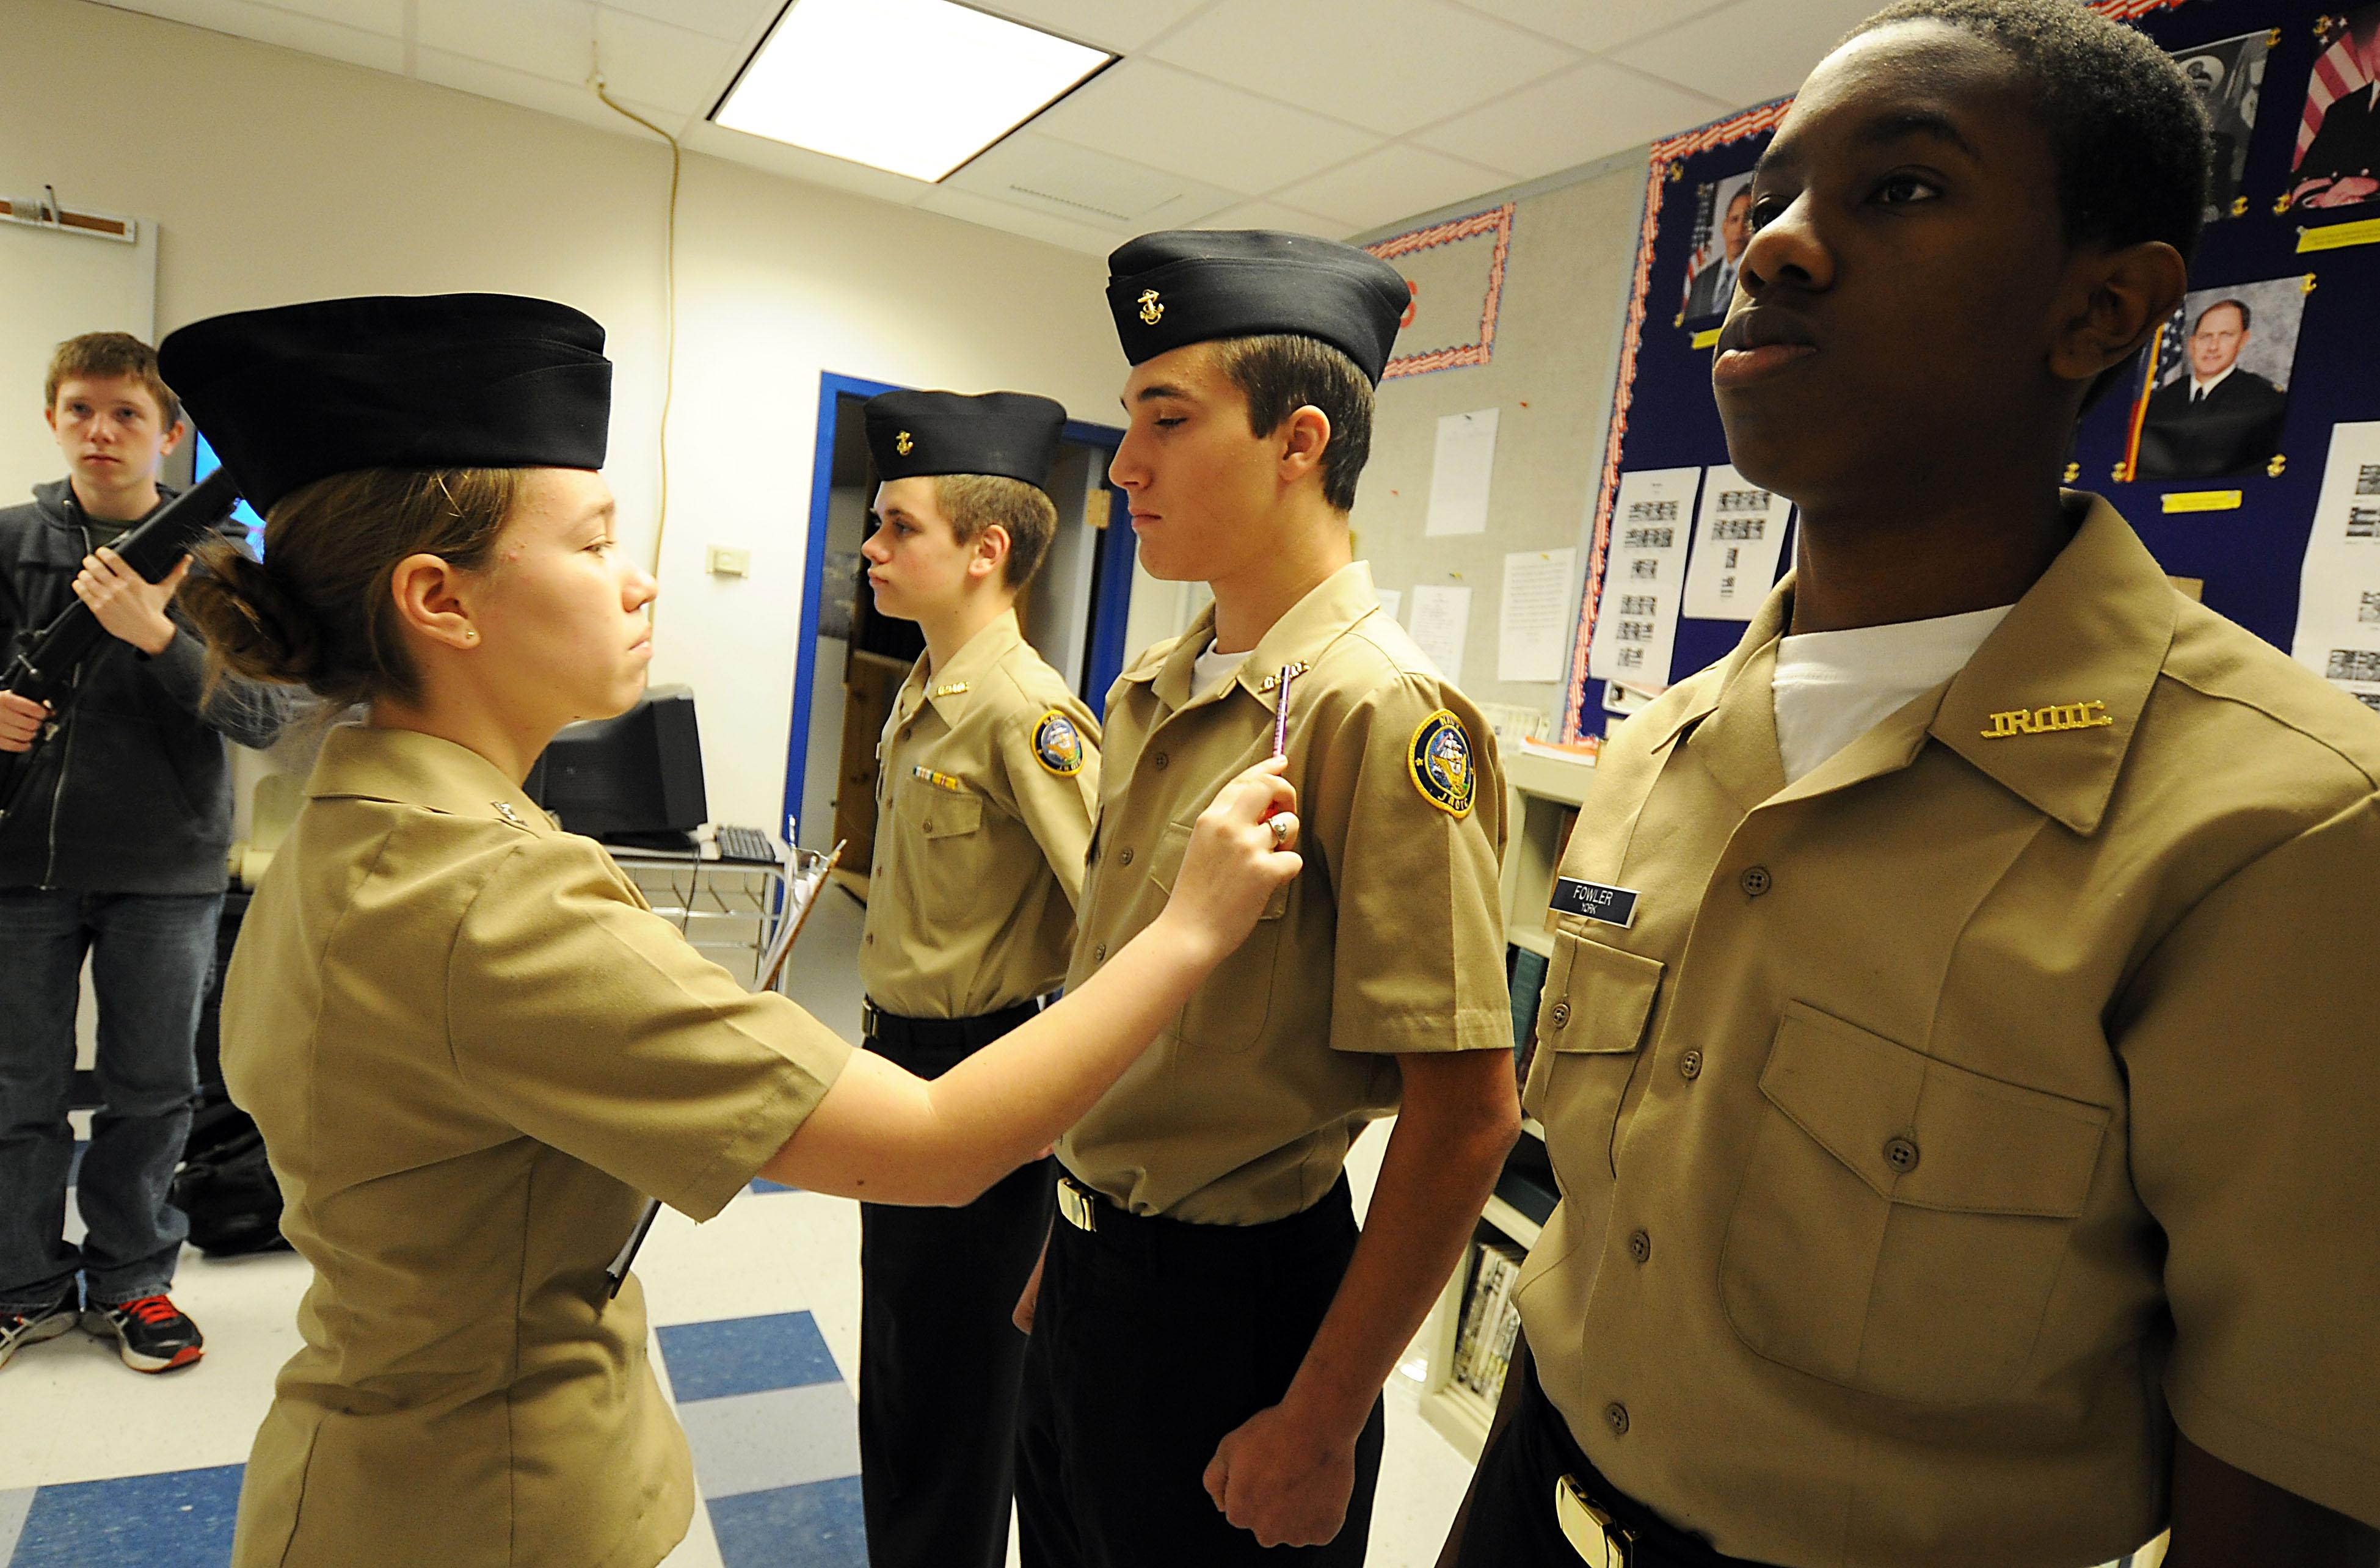 Us Navy Uniform History